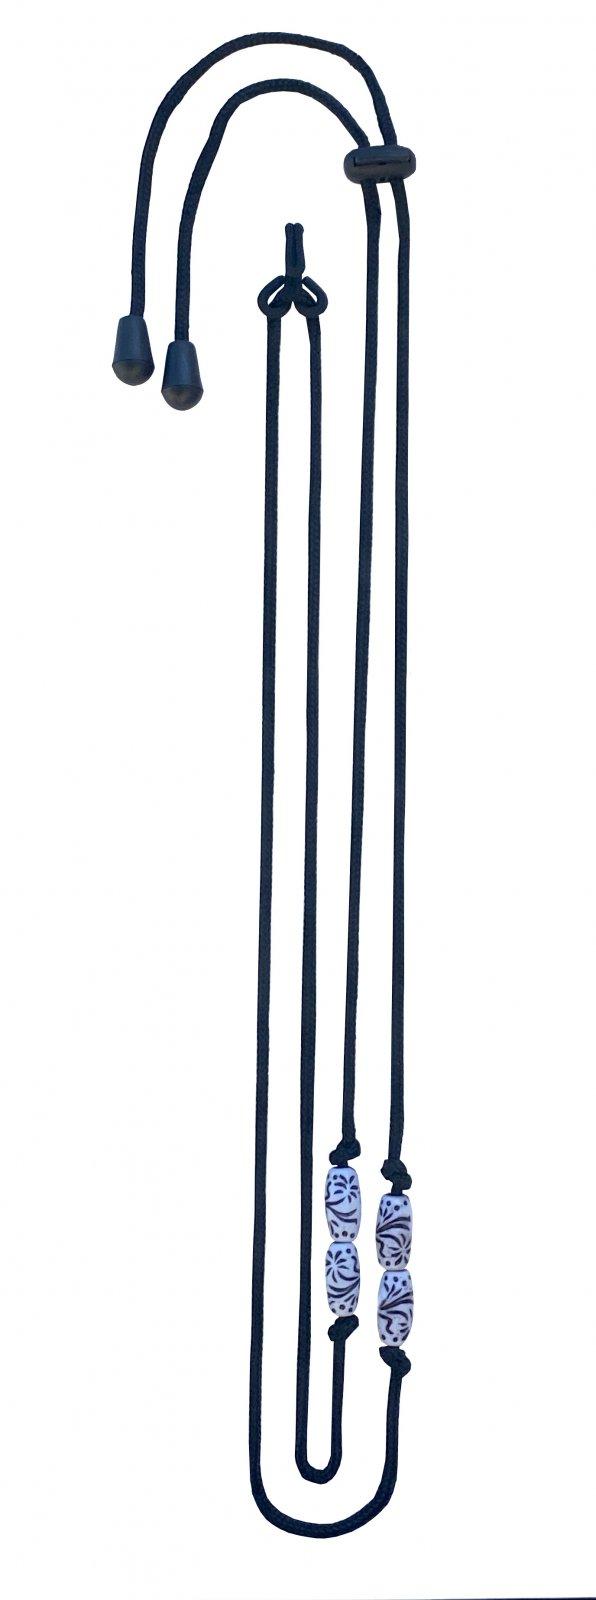 Sherrin's Threads Corded Neck Strap - White